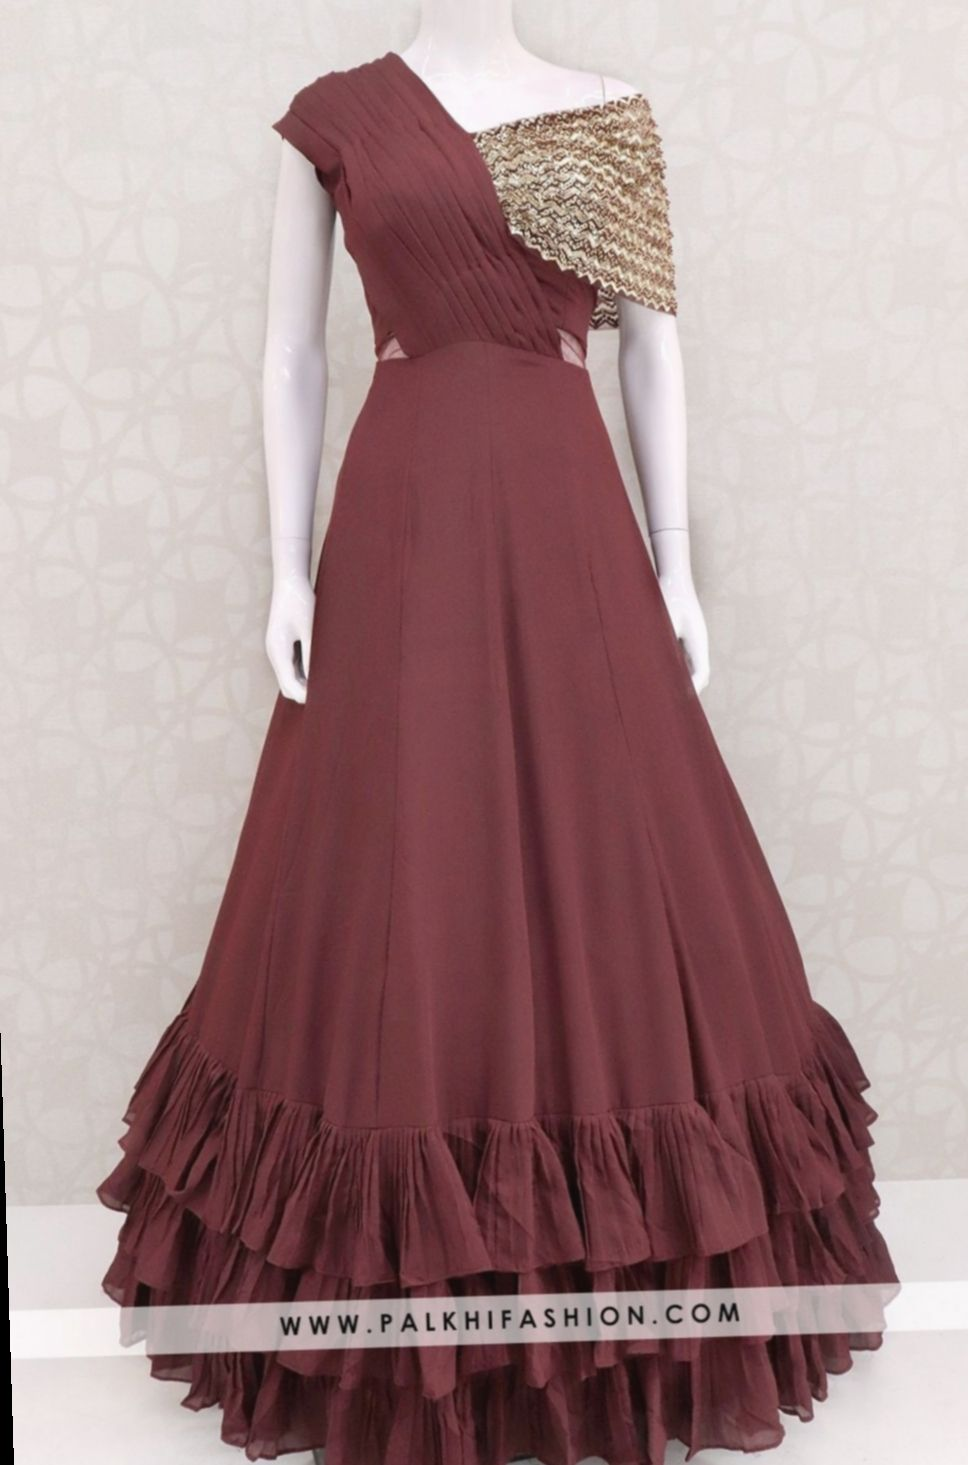 Dress Designs Patterns Indian Fashion Style Outfit Indian Fashion Dresses Dress Design Patterns Designer Party Wear Dresses